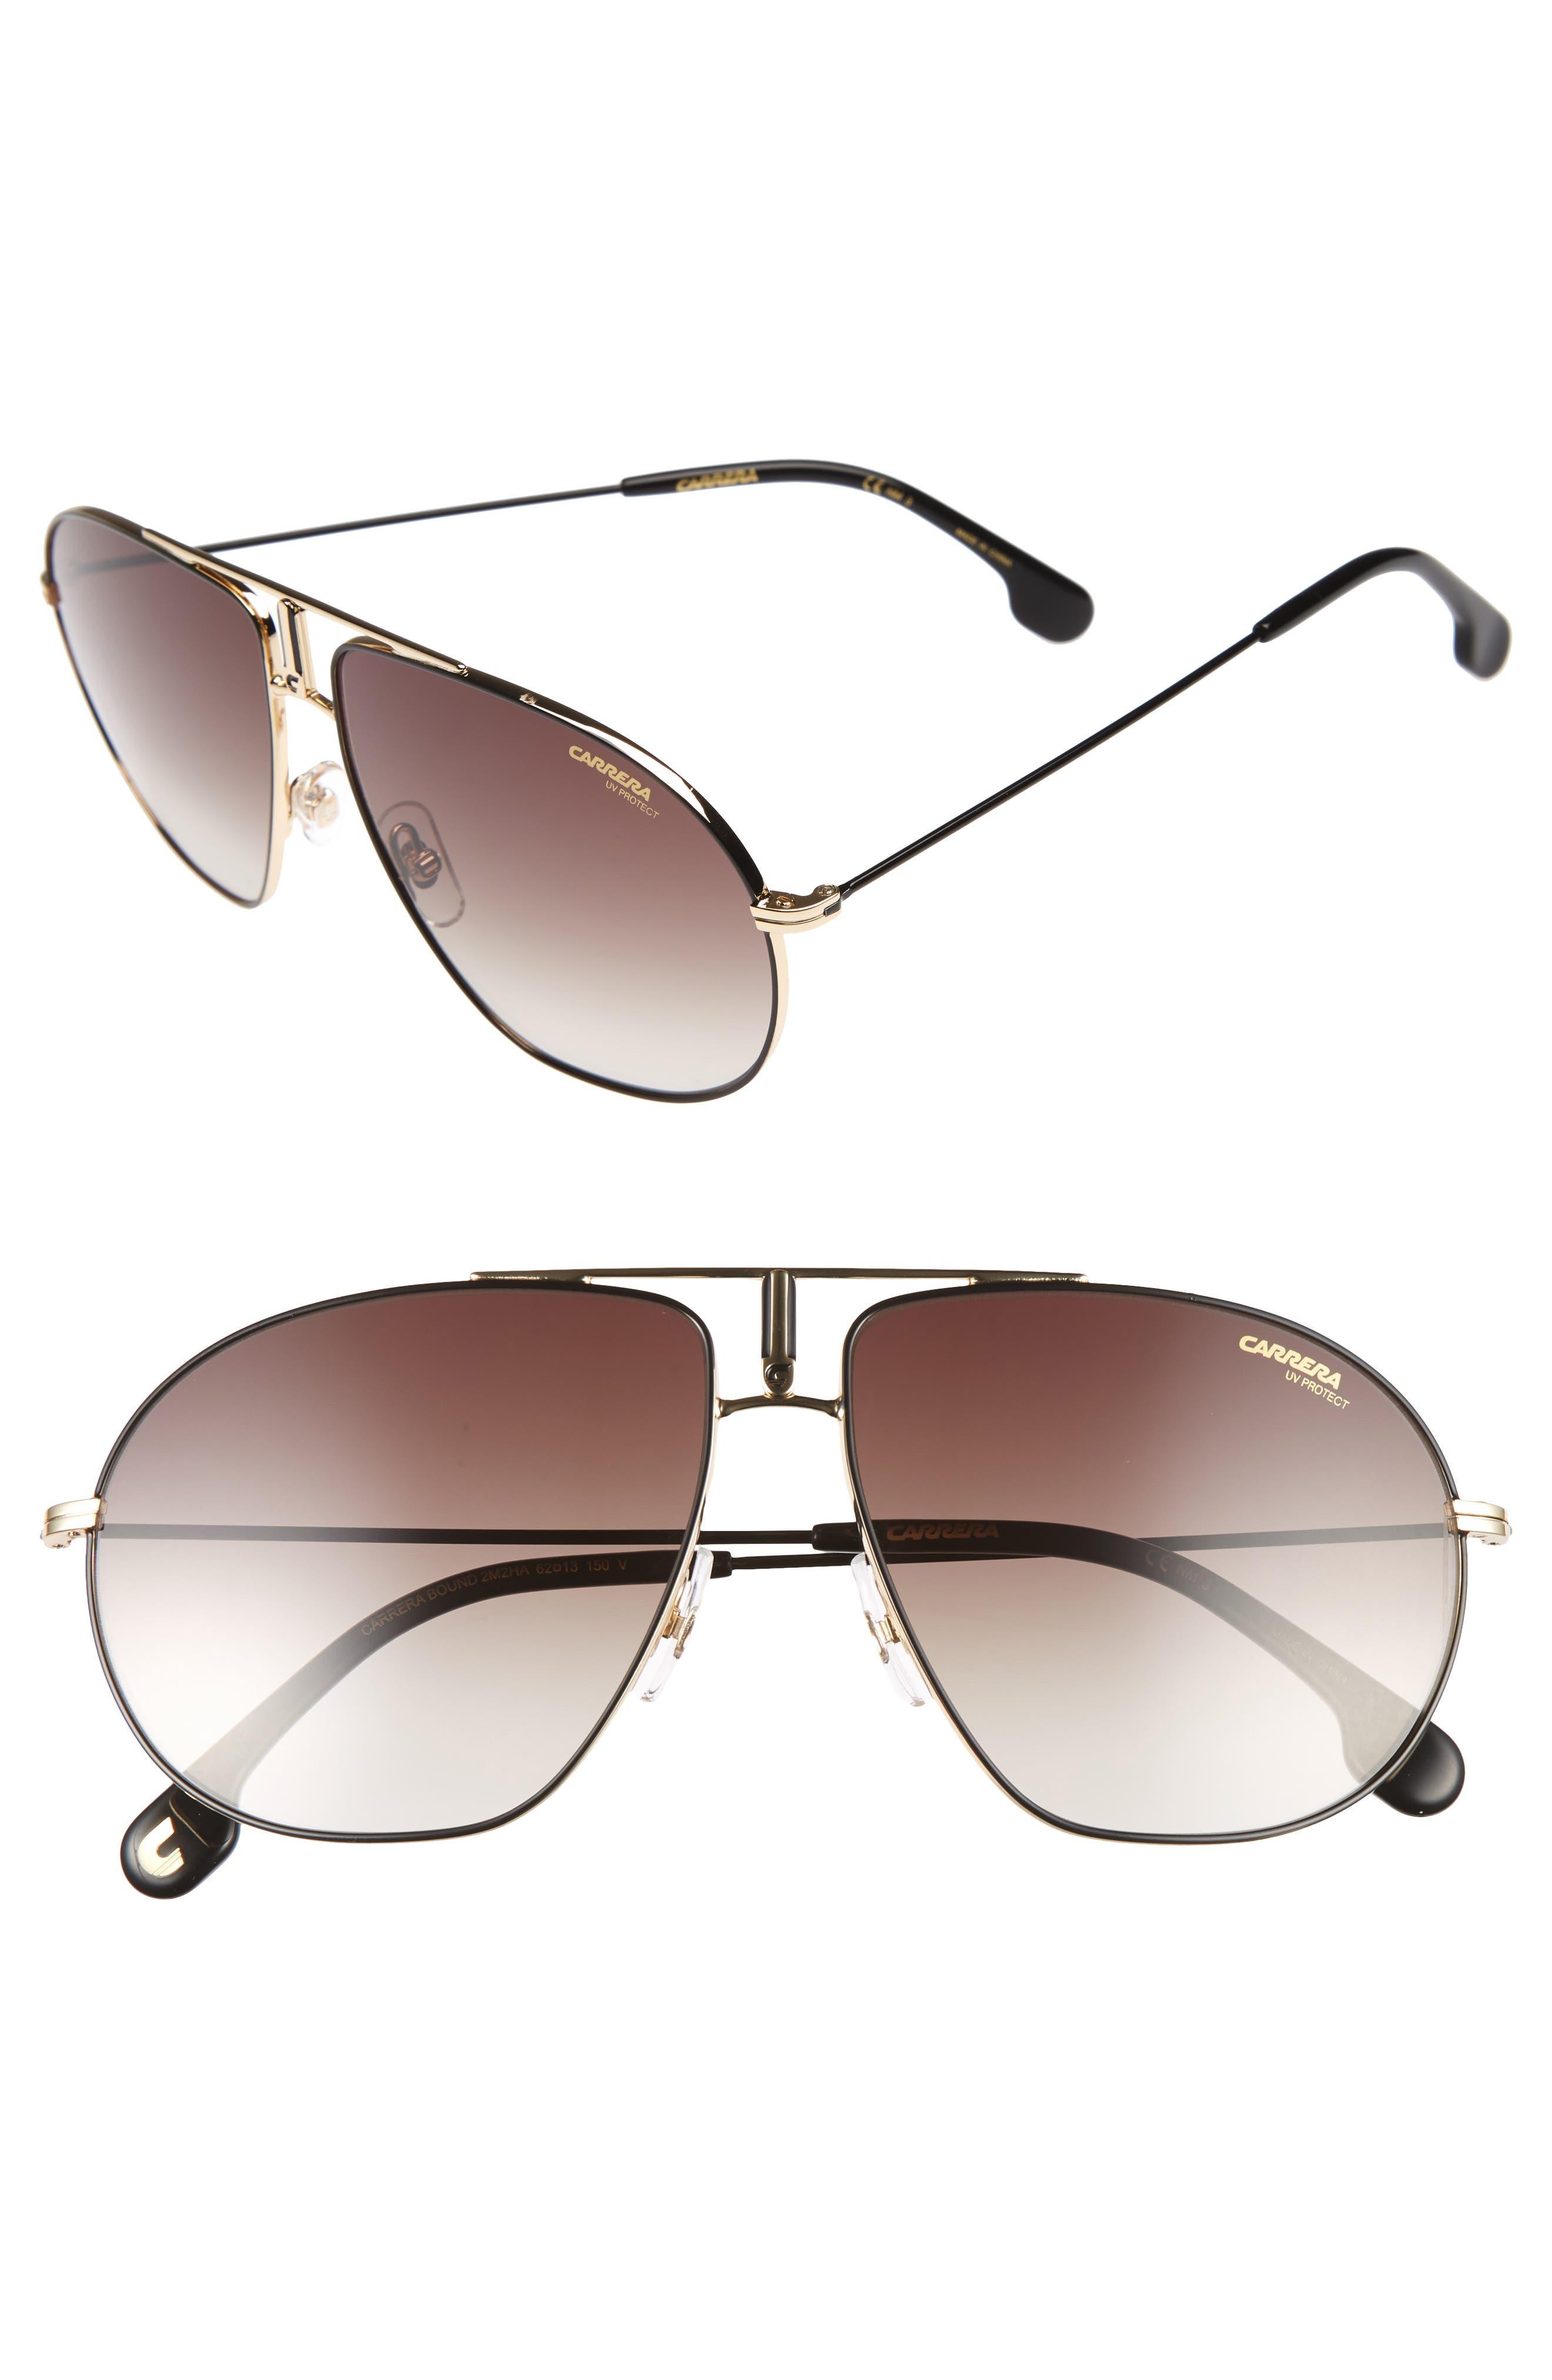 Bounds 60mm Gradient Aviator Sunglasses,                         Main,                         color, Black Gold